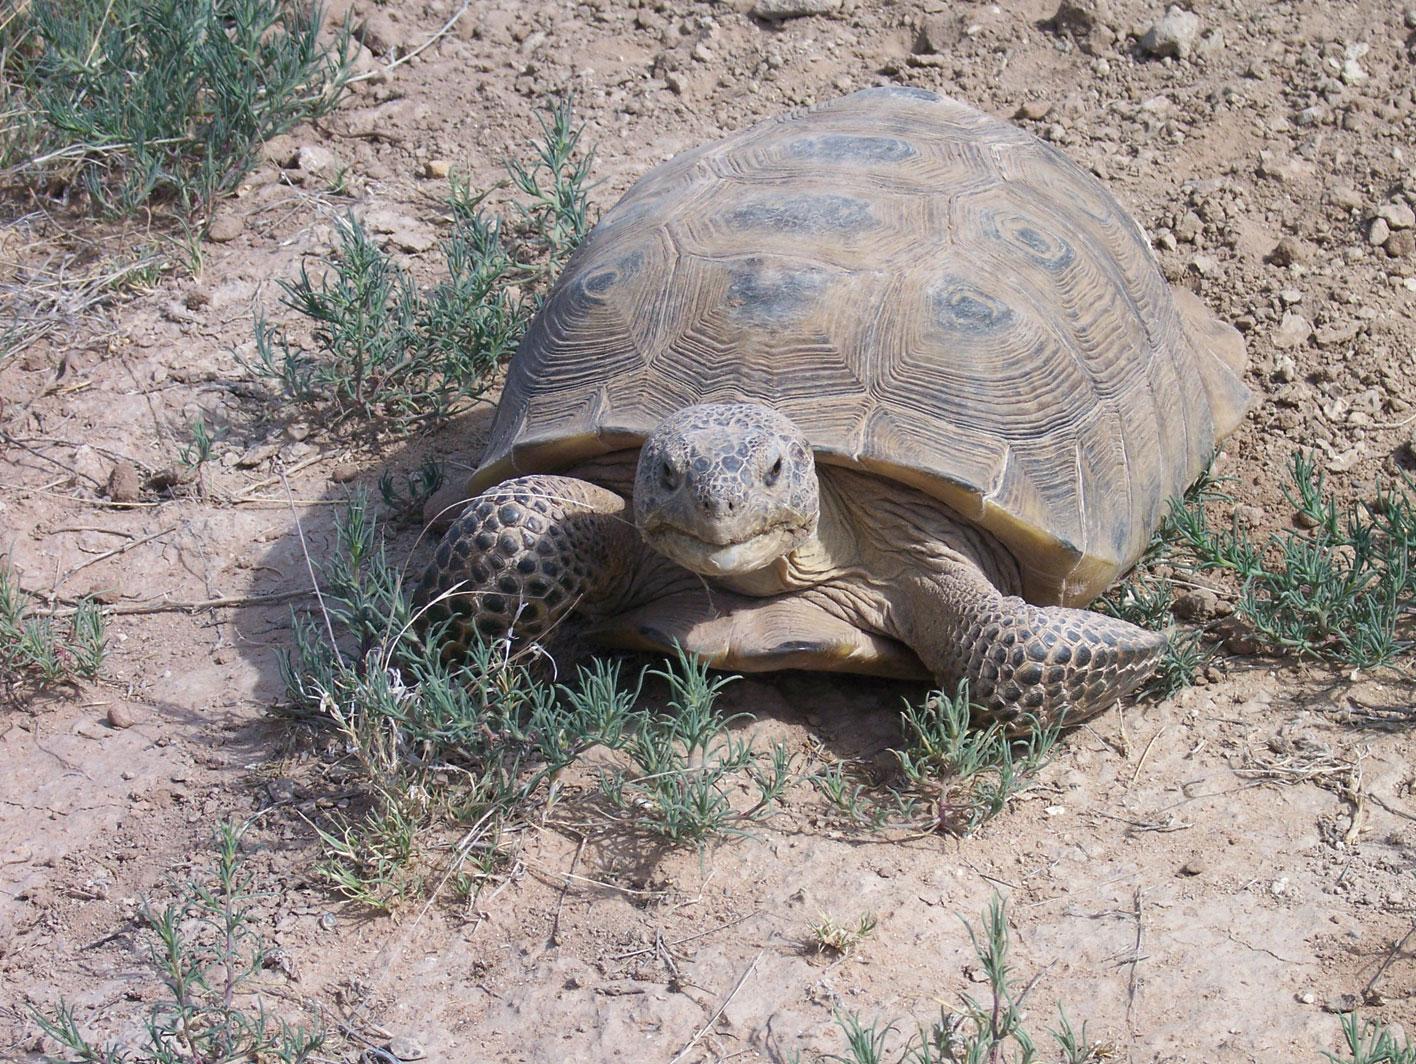 Photograph of large bolson tortoise by John Walker